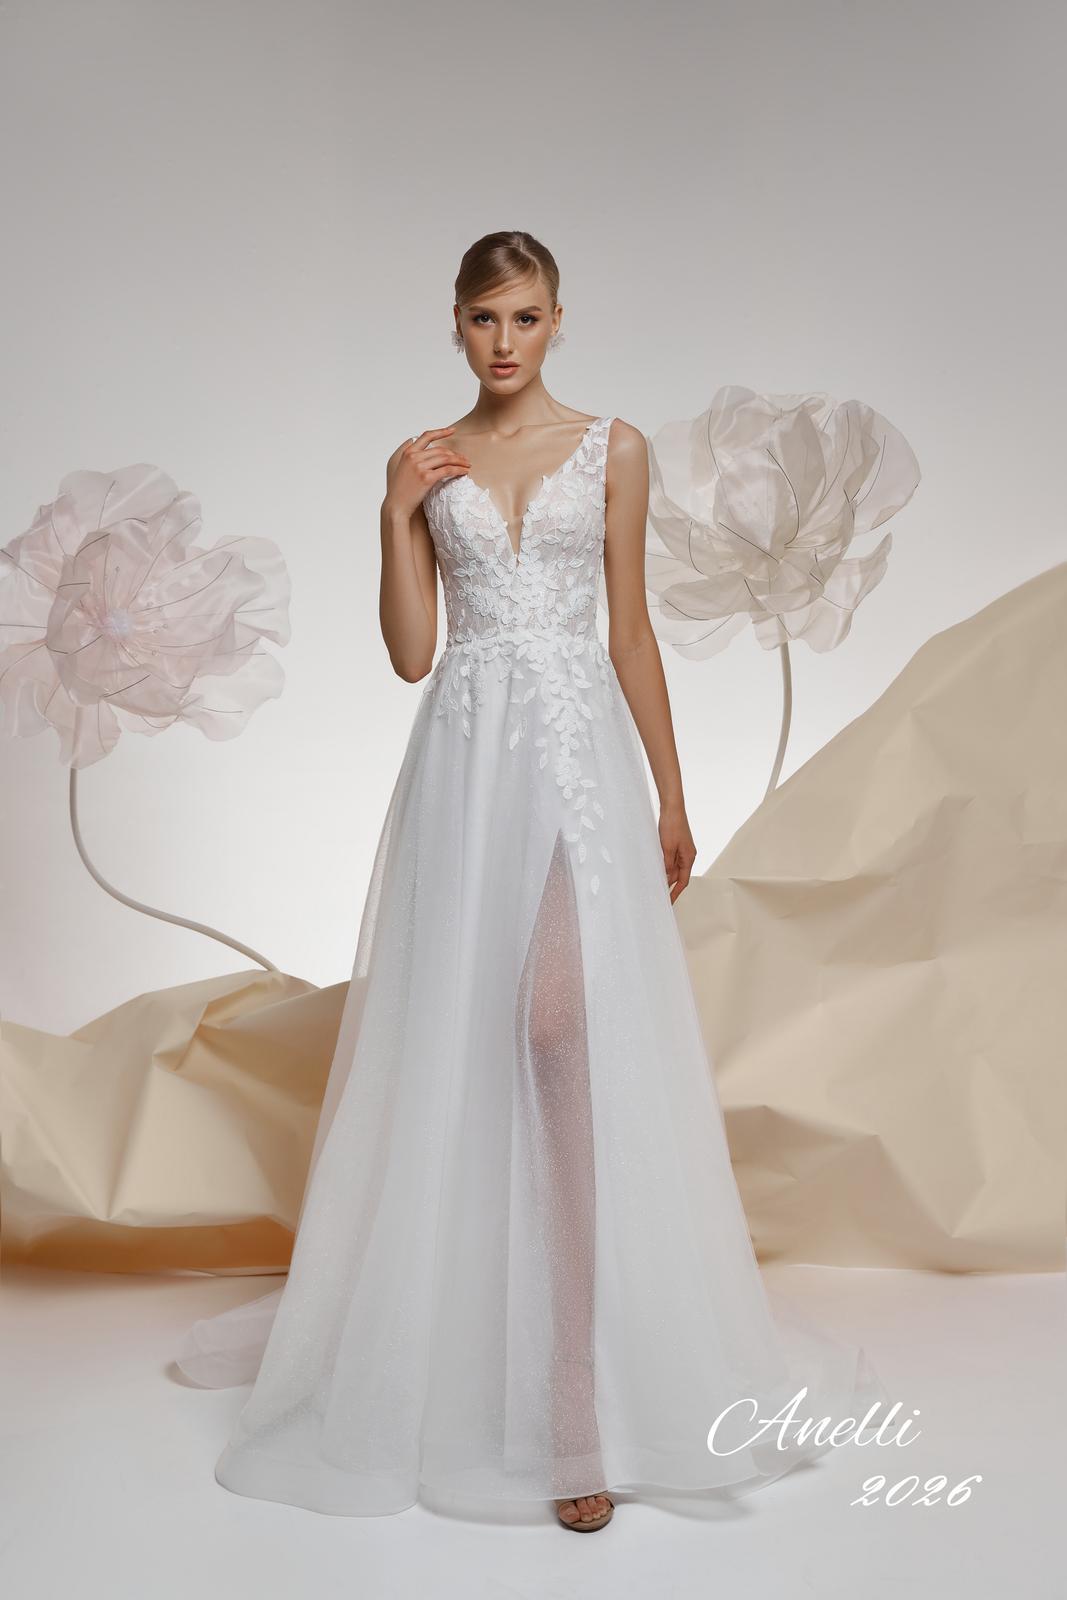 Svadobné šaty - Imagine 2026 - Obrázok č. 1